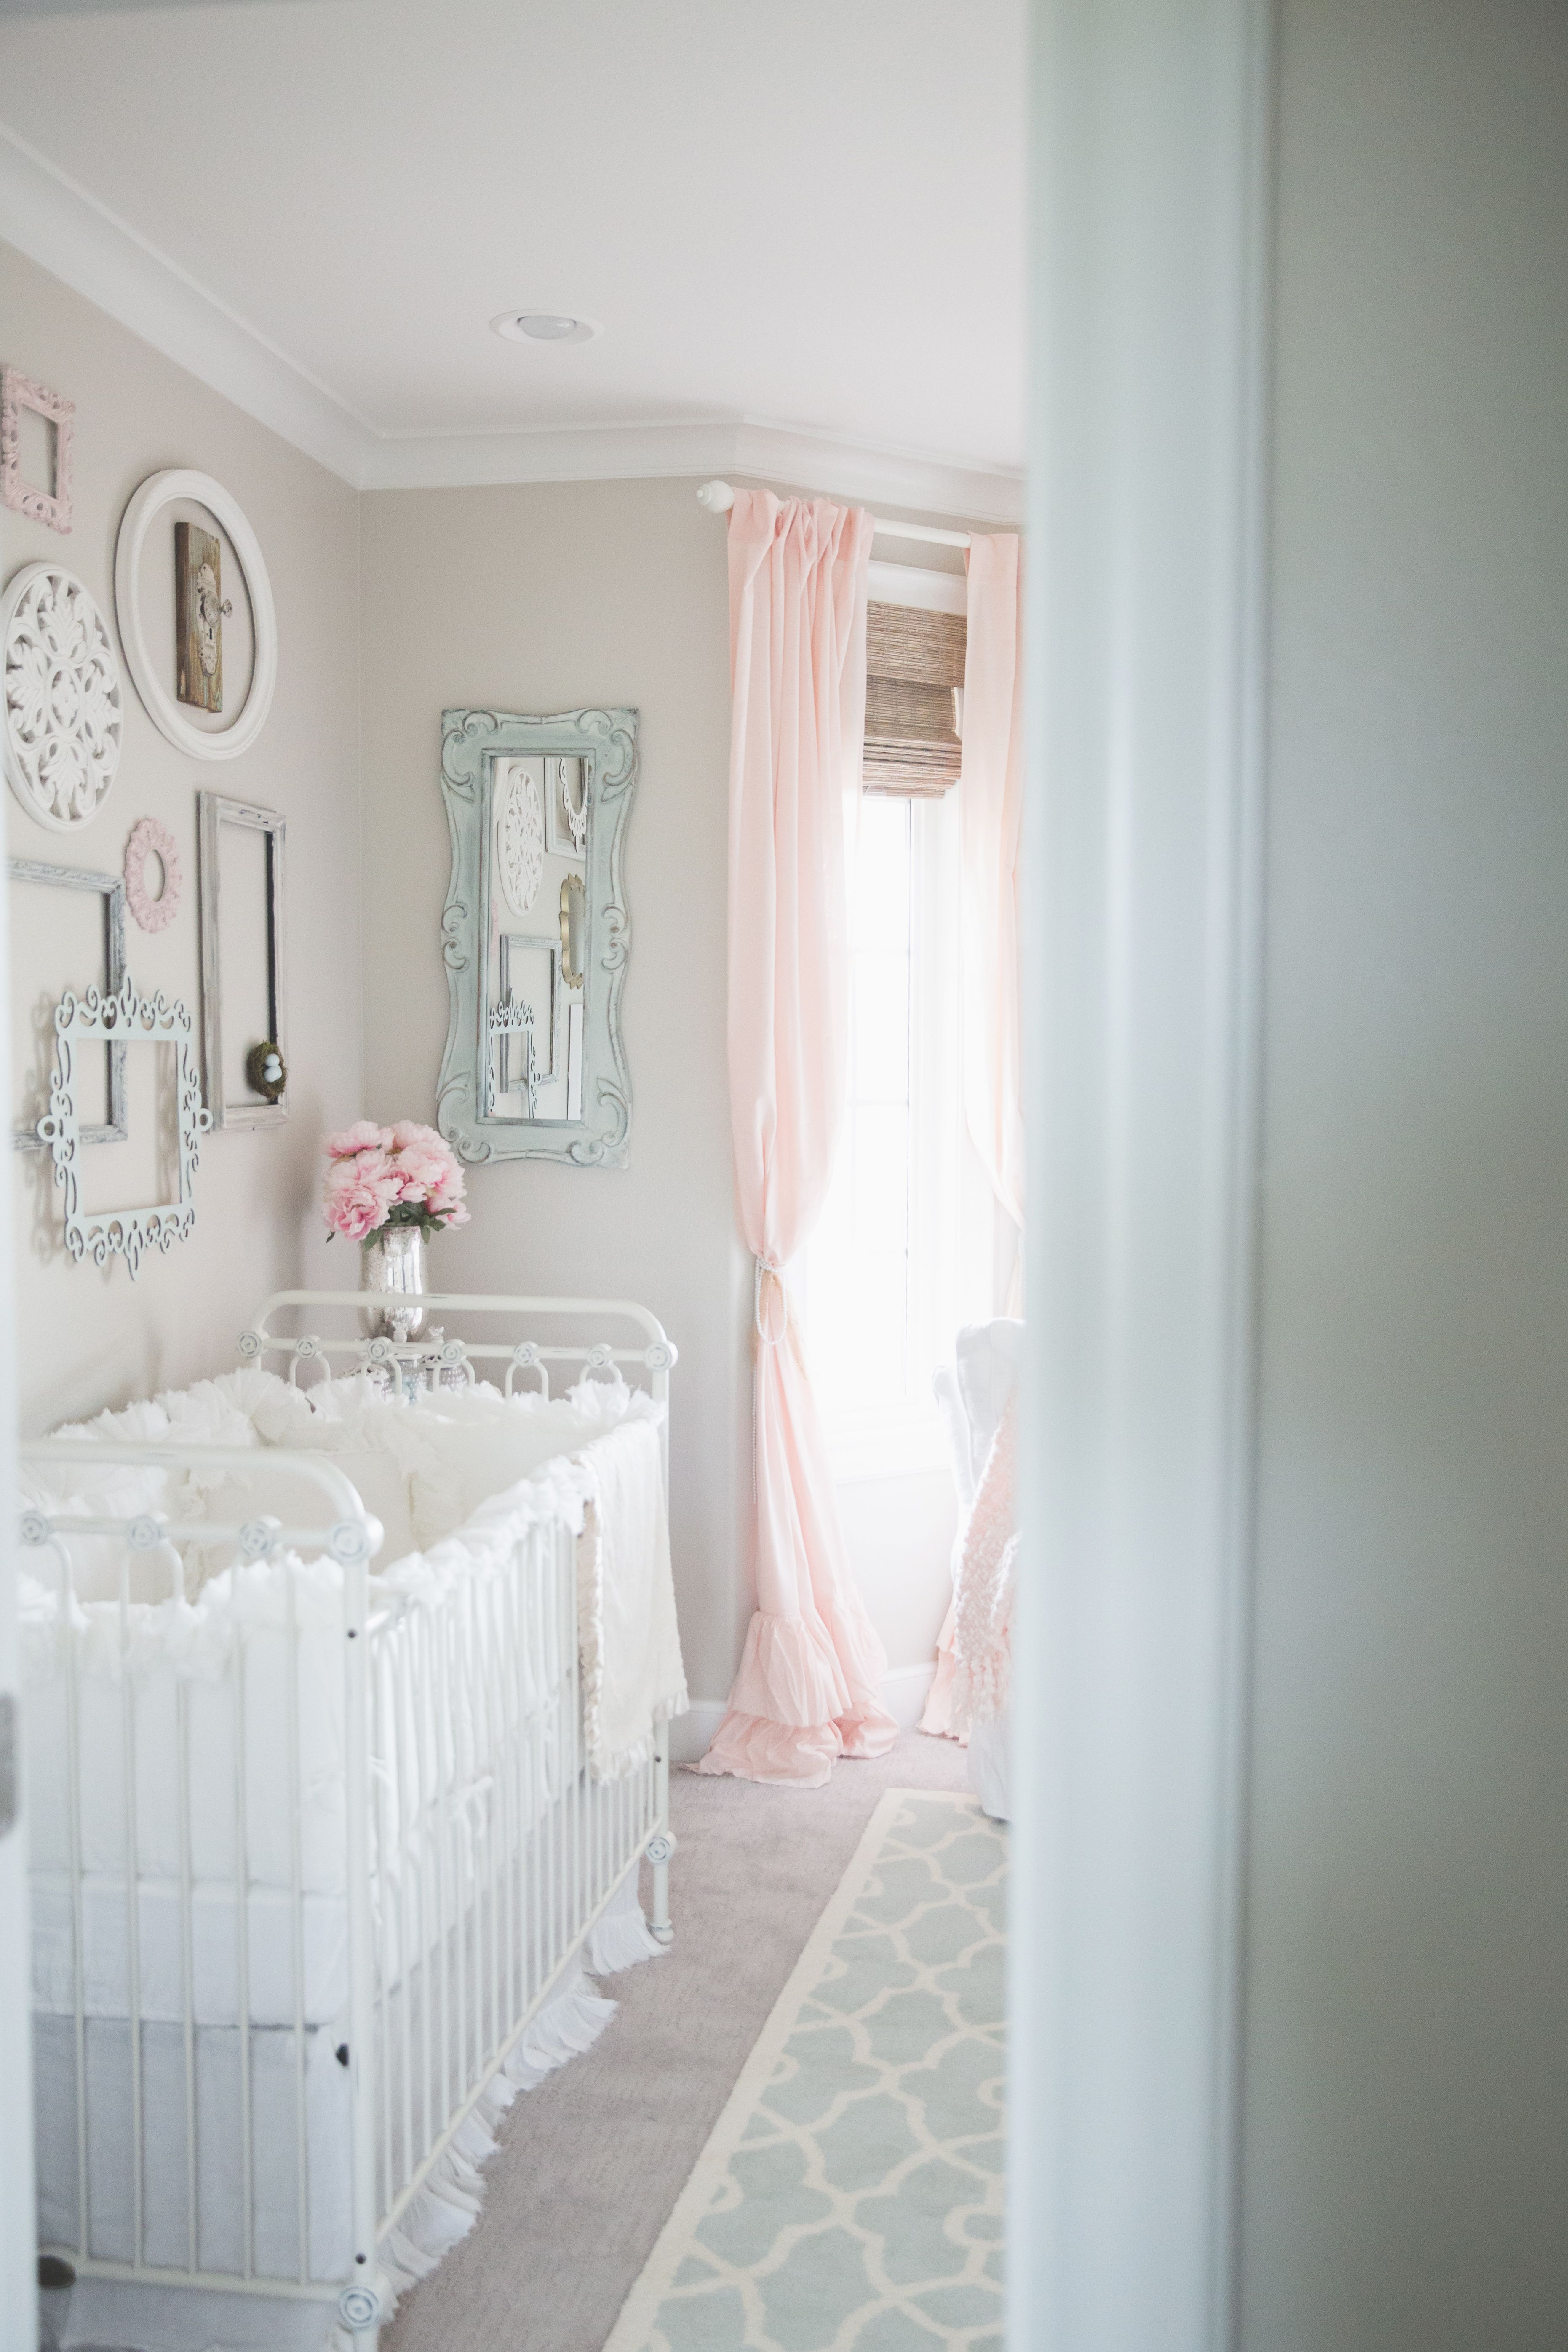 Dainty, Soft and Sweet Nursery | Cuarto bebe y Bebe